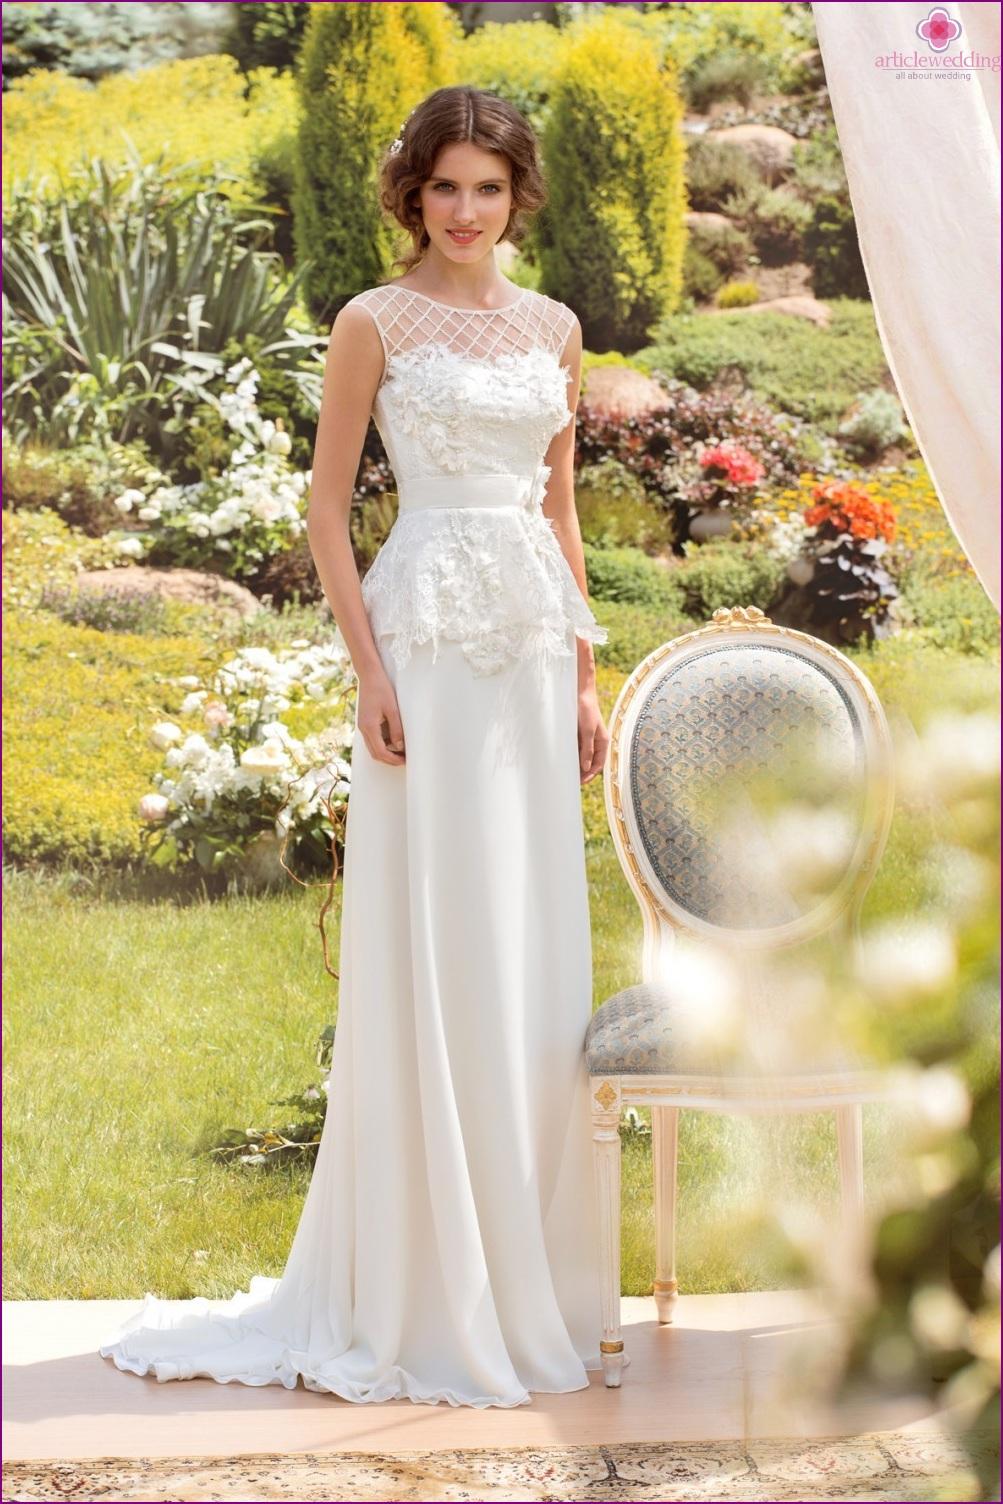 Fashionable wedding dress